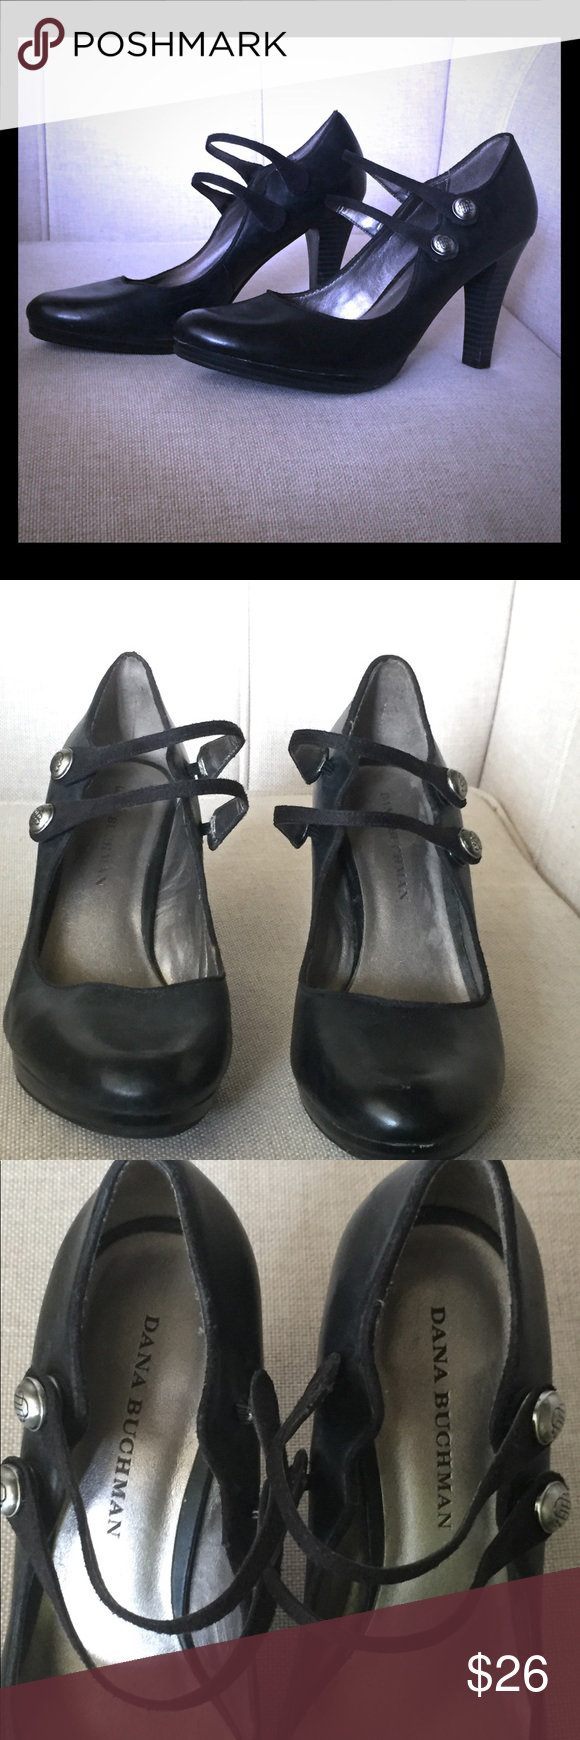 8e1a9a0f9909ca Dana Buchman Black Booties! Button Closure Black leather Booties. Super  comfortable! Amazing button